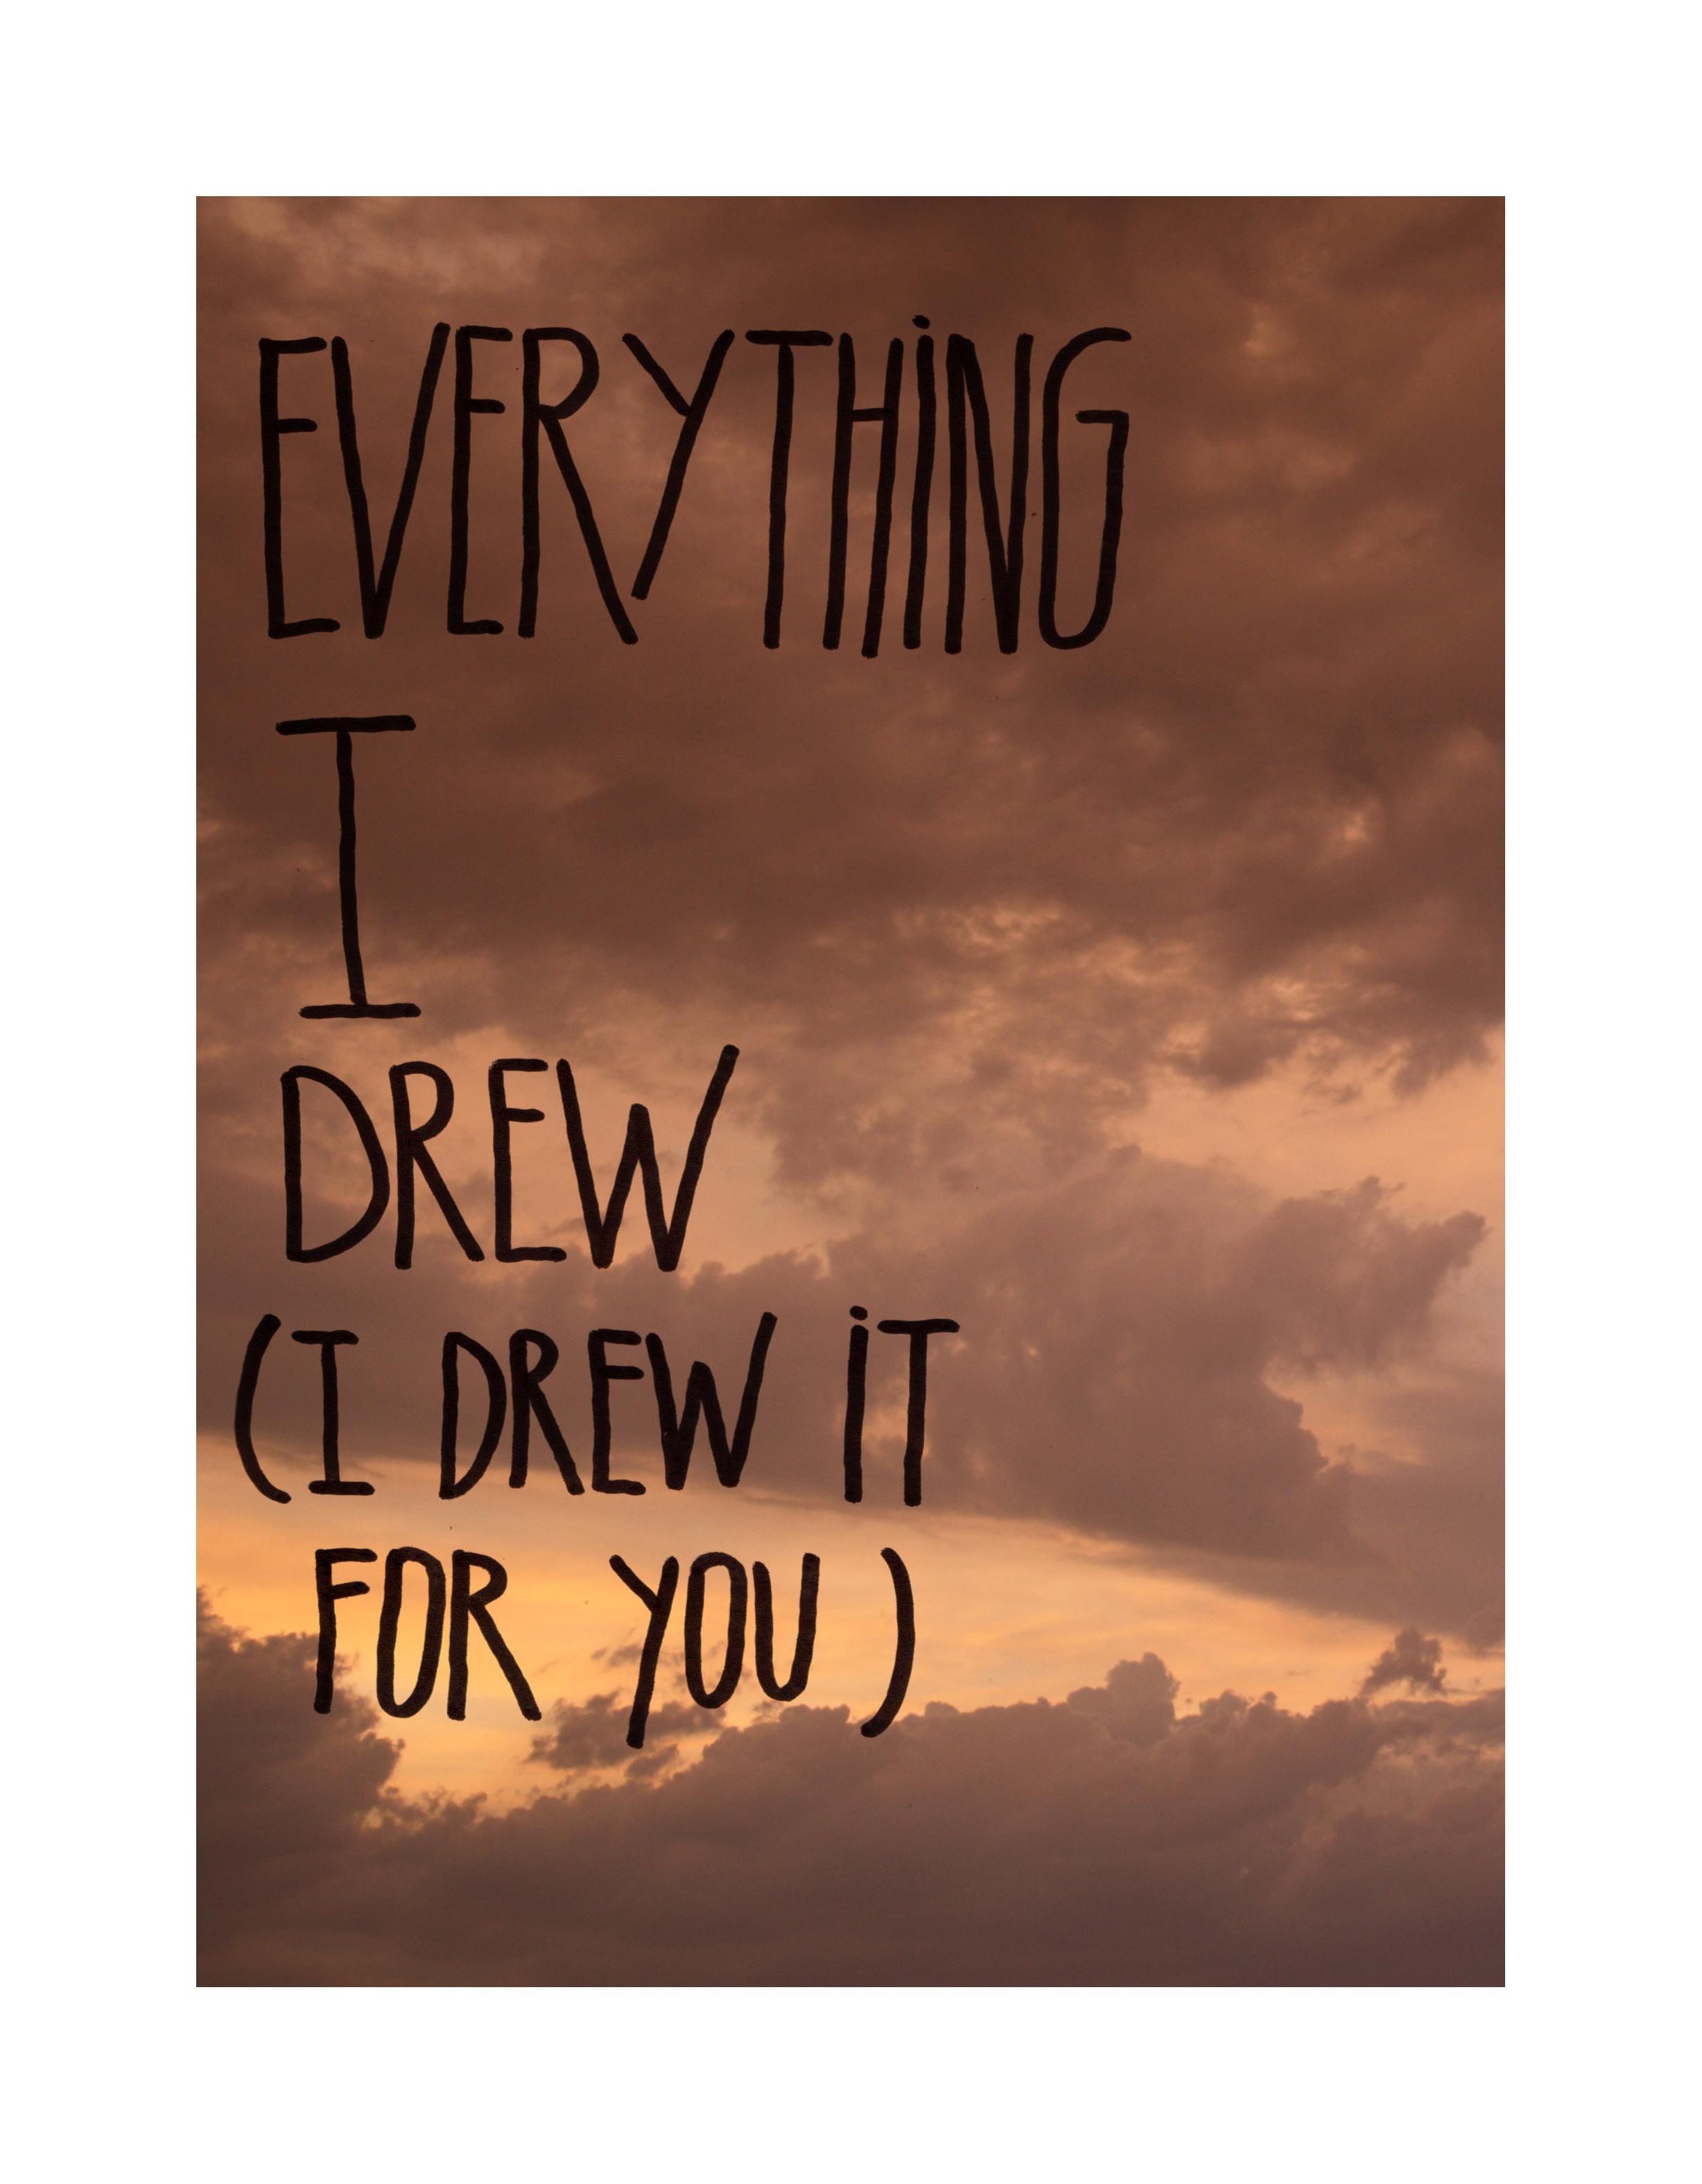 Everything I Drew (I Drew It For You)